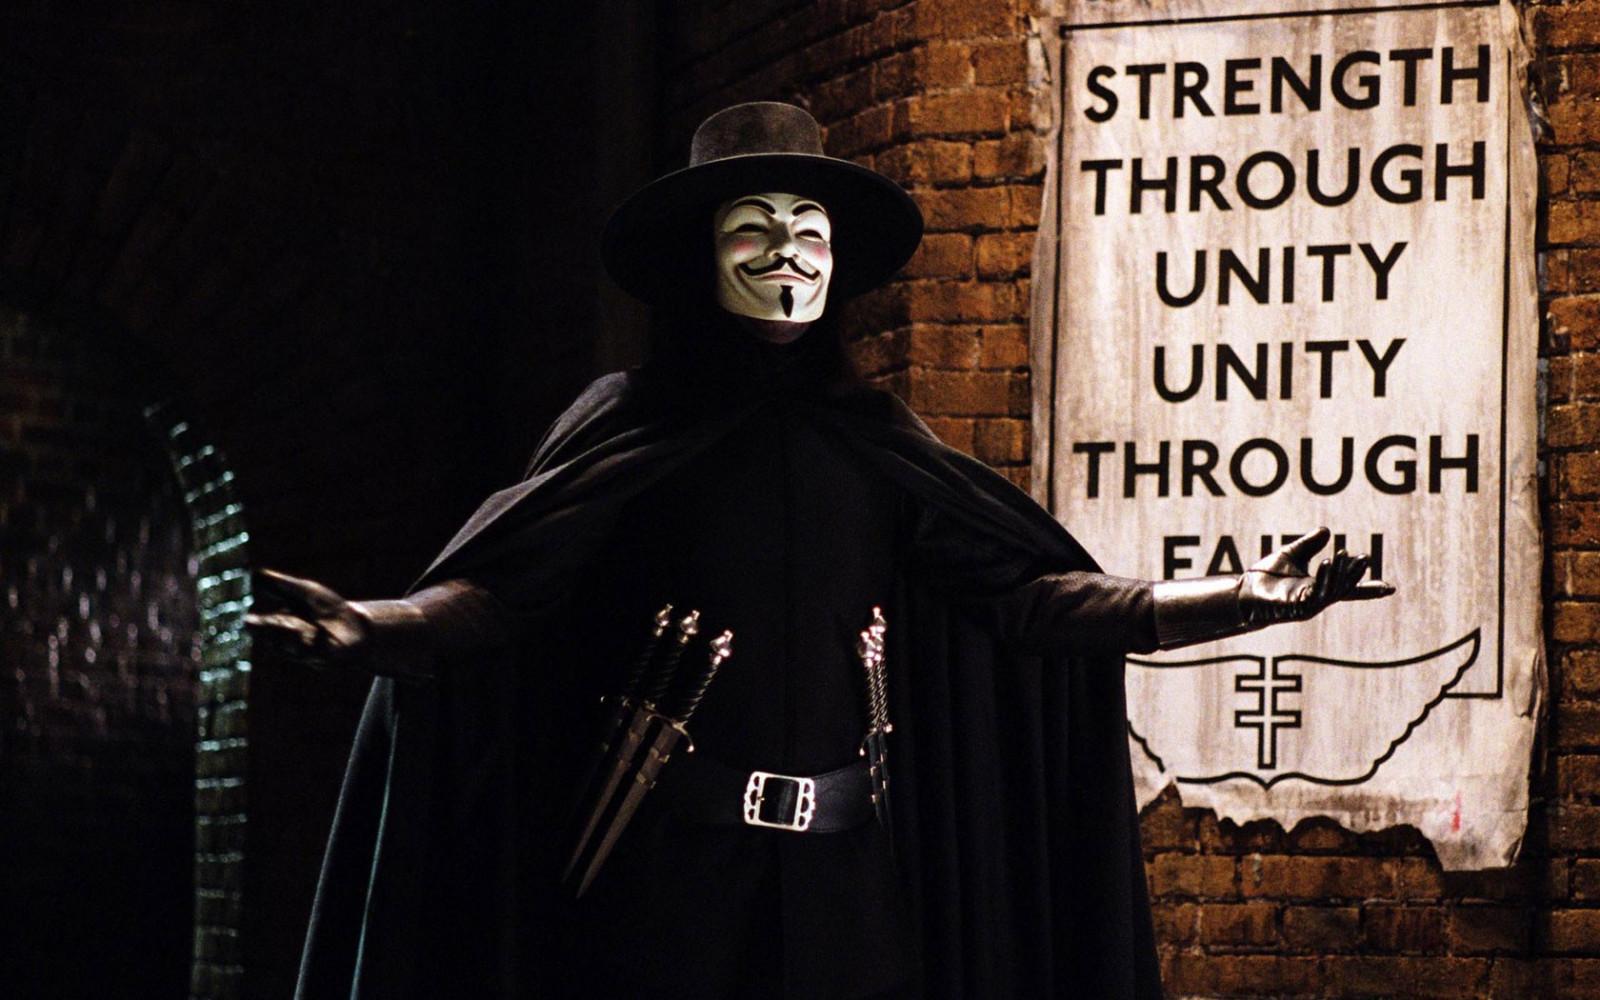 V for Vendetta 2006  Rotten Tomatoes  Movie Trailers